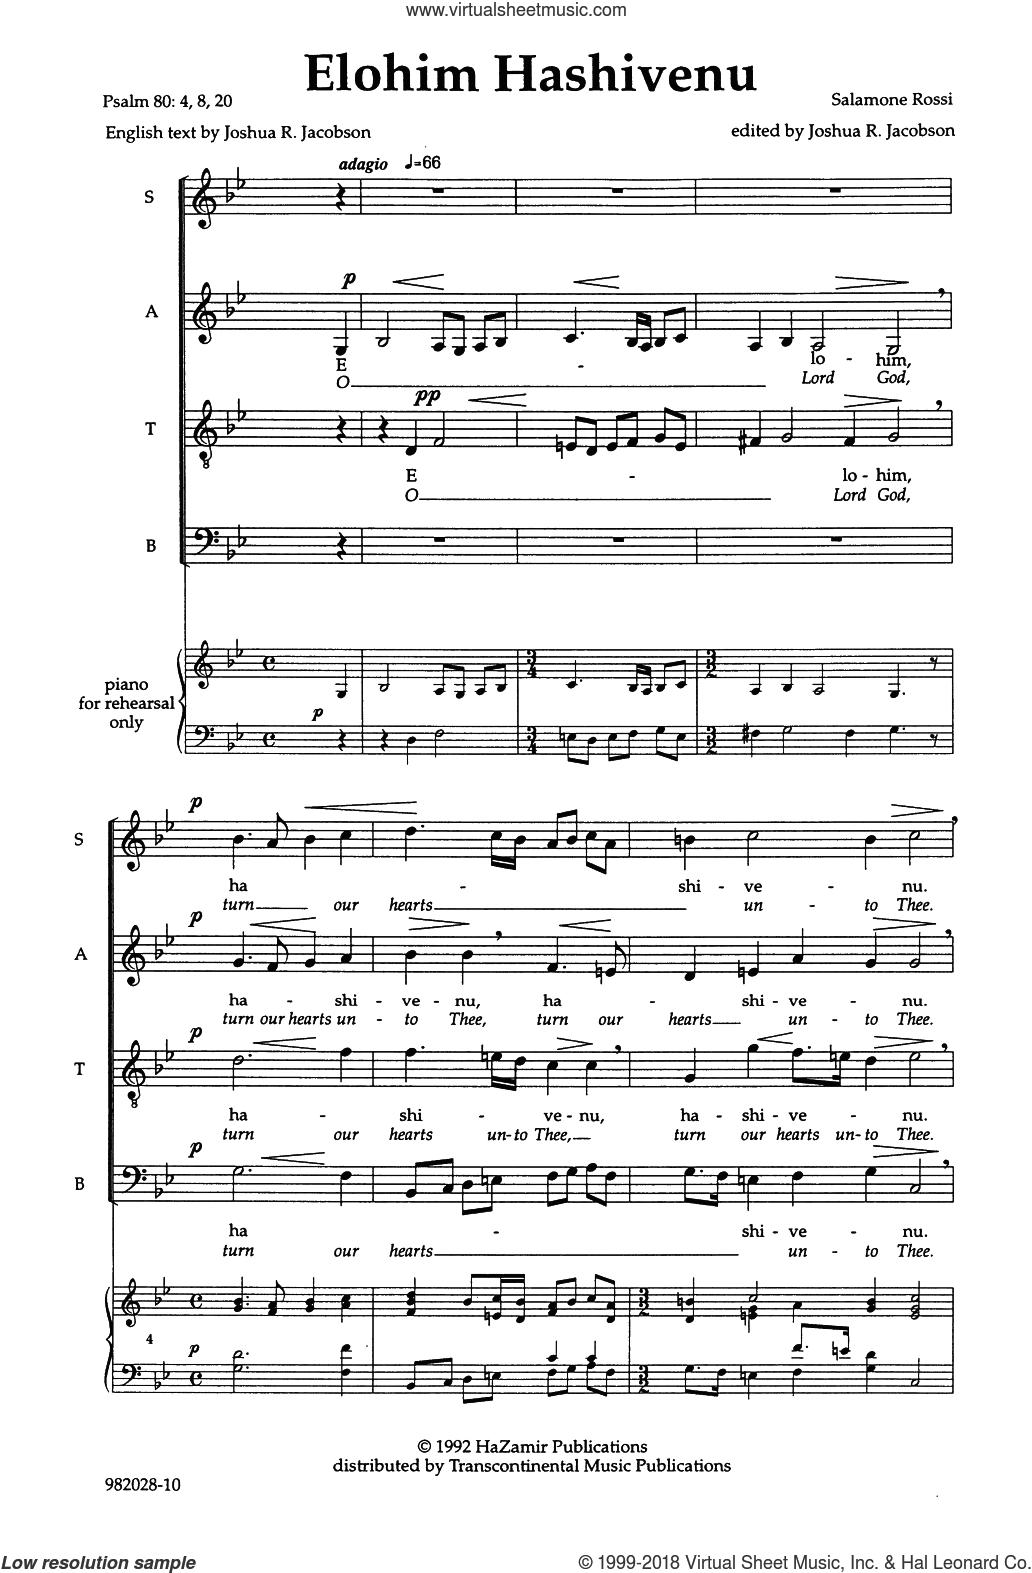 Elohim Hashiveinu (O Lord, Turn Our Hearts) sheet music for choir (SATB: soprano, alto, tenor, bass) by Joshua Jacobson and Salamone Rossi, intermediate skill level